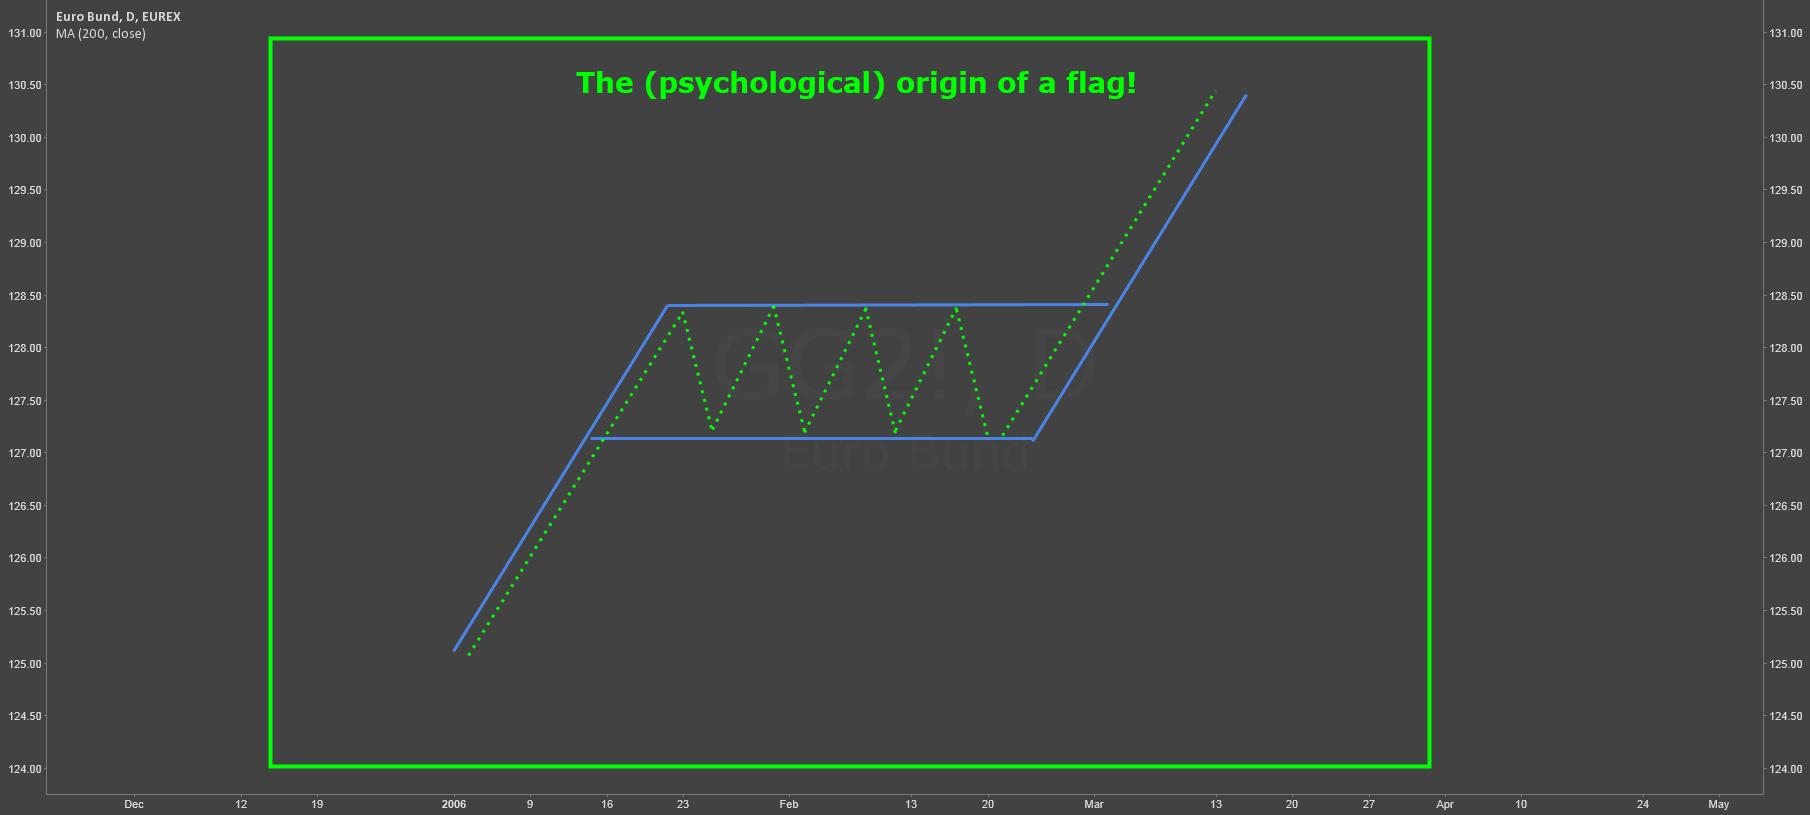 The (psychological) origin of a flag